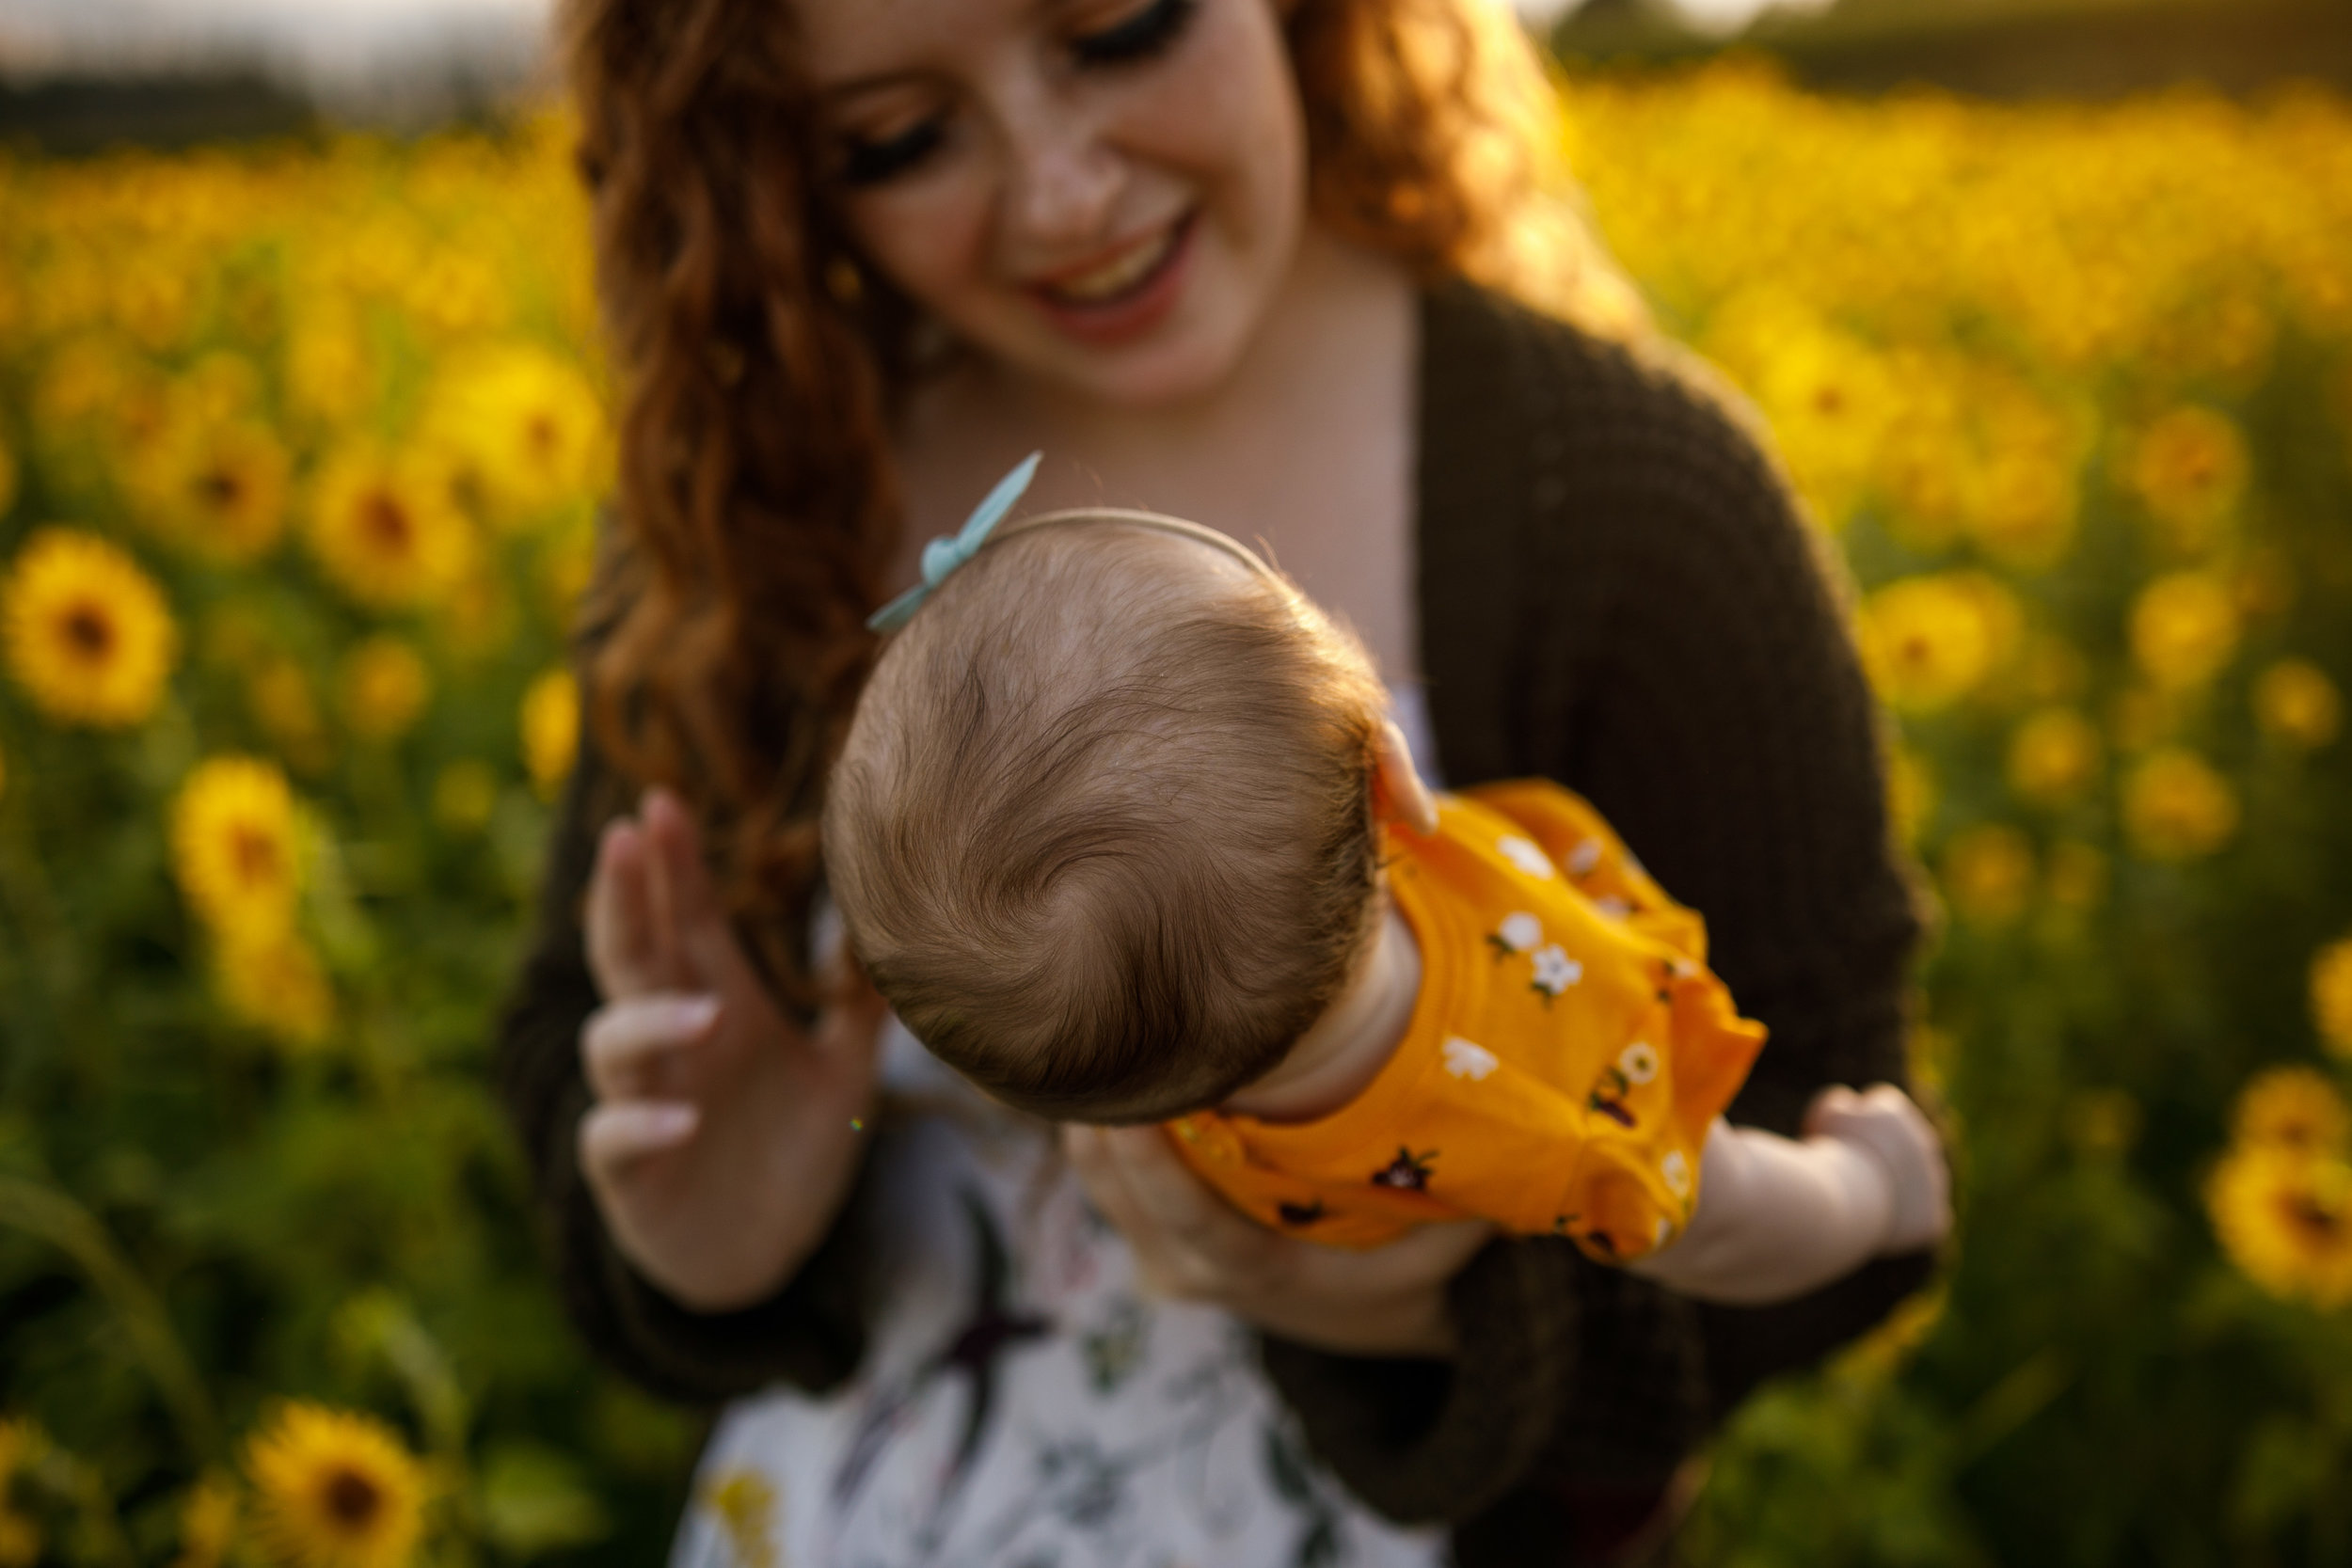 Morris Family Summer 2019 - Grand Rapids Photographer - Grand Rapids Family Photographer - Ed Dunneback and Girls - J Darling Photo 019.jpg